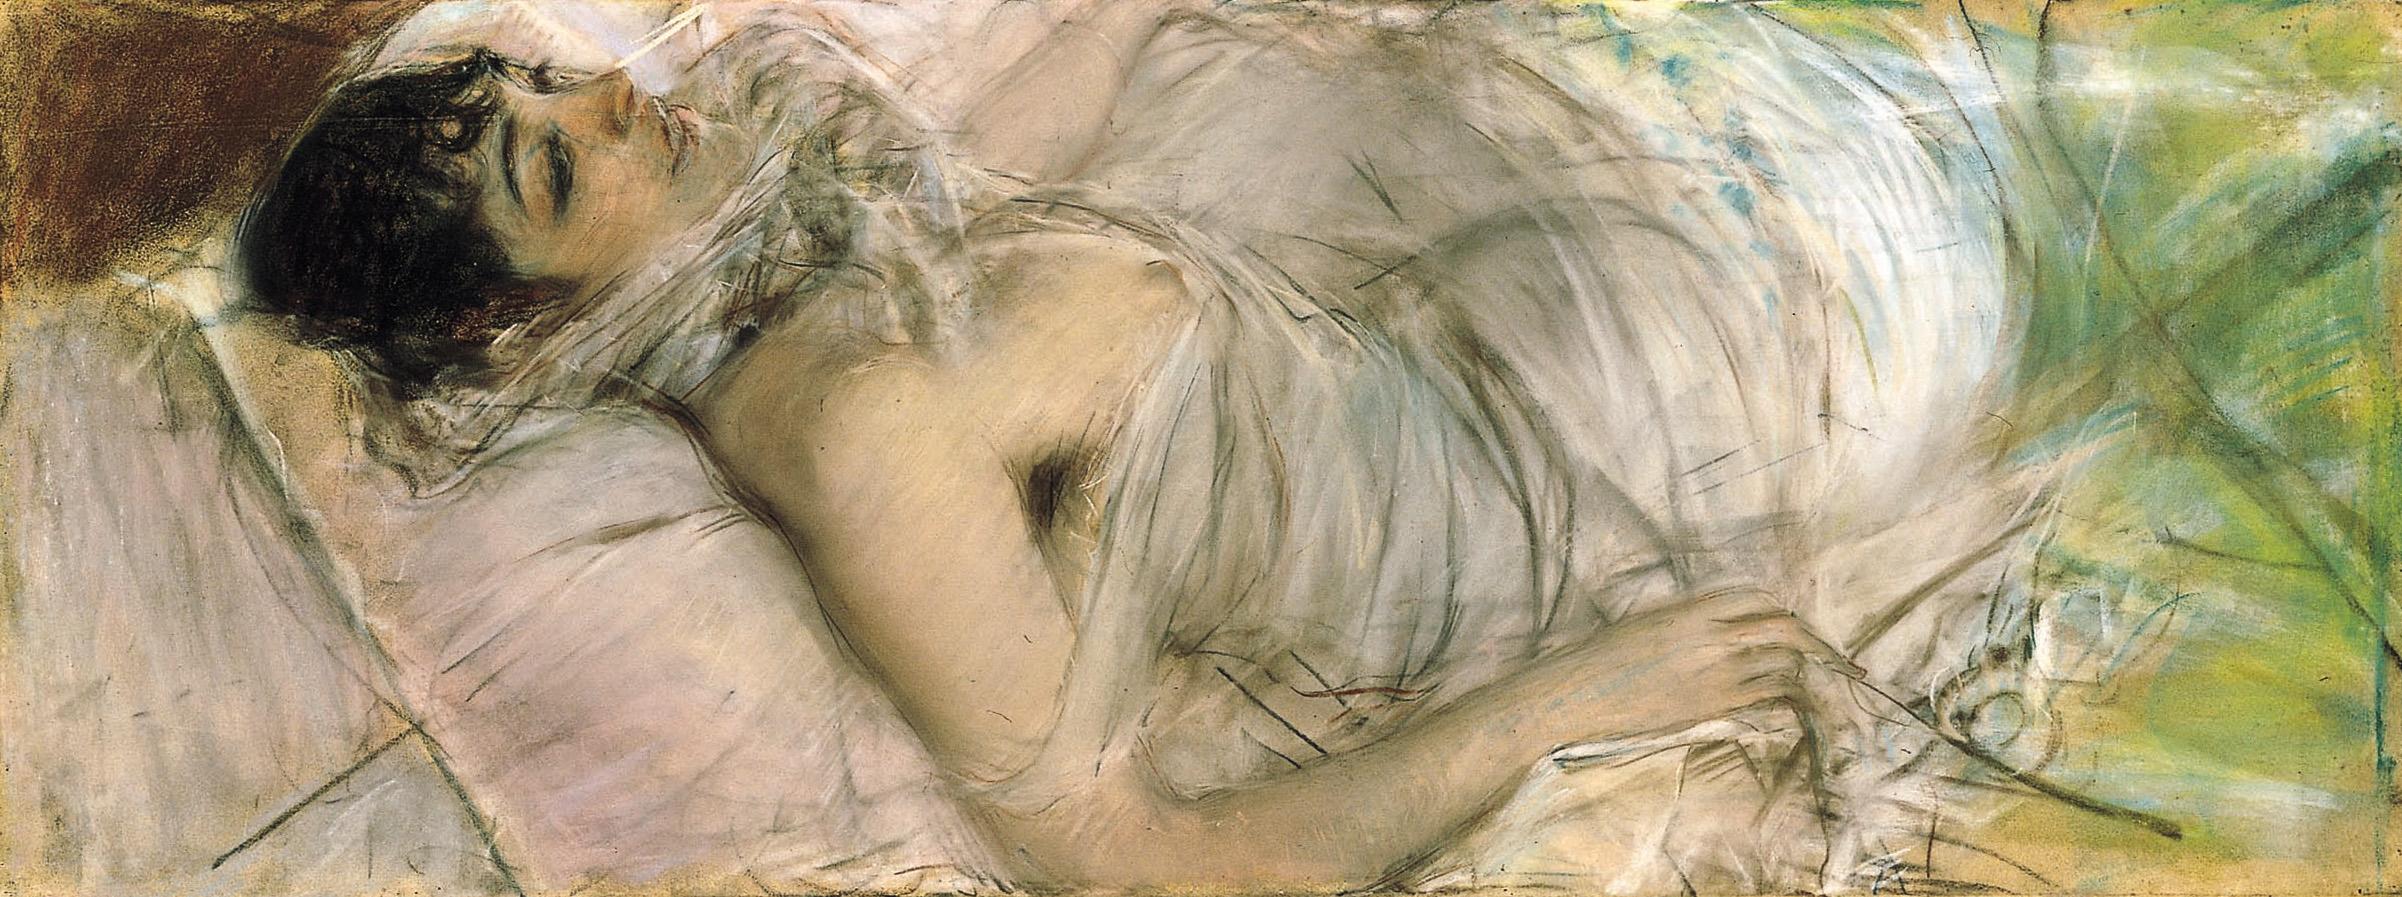 """Giovane bruna a letto (Mme de Rasty)"", 1882 circa"